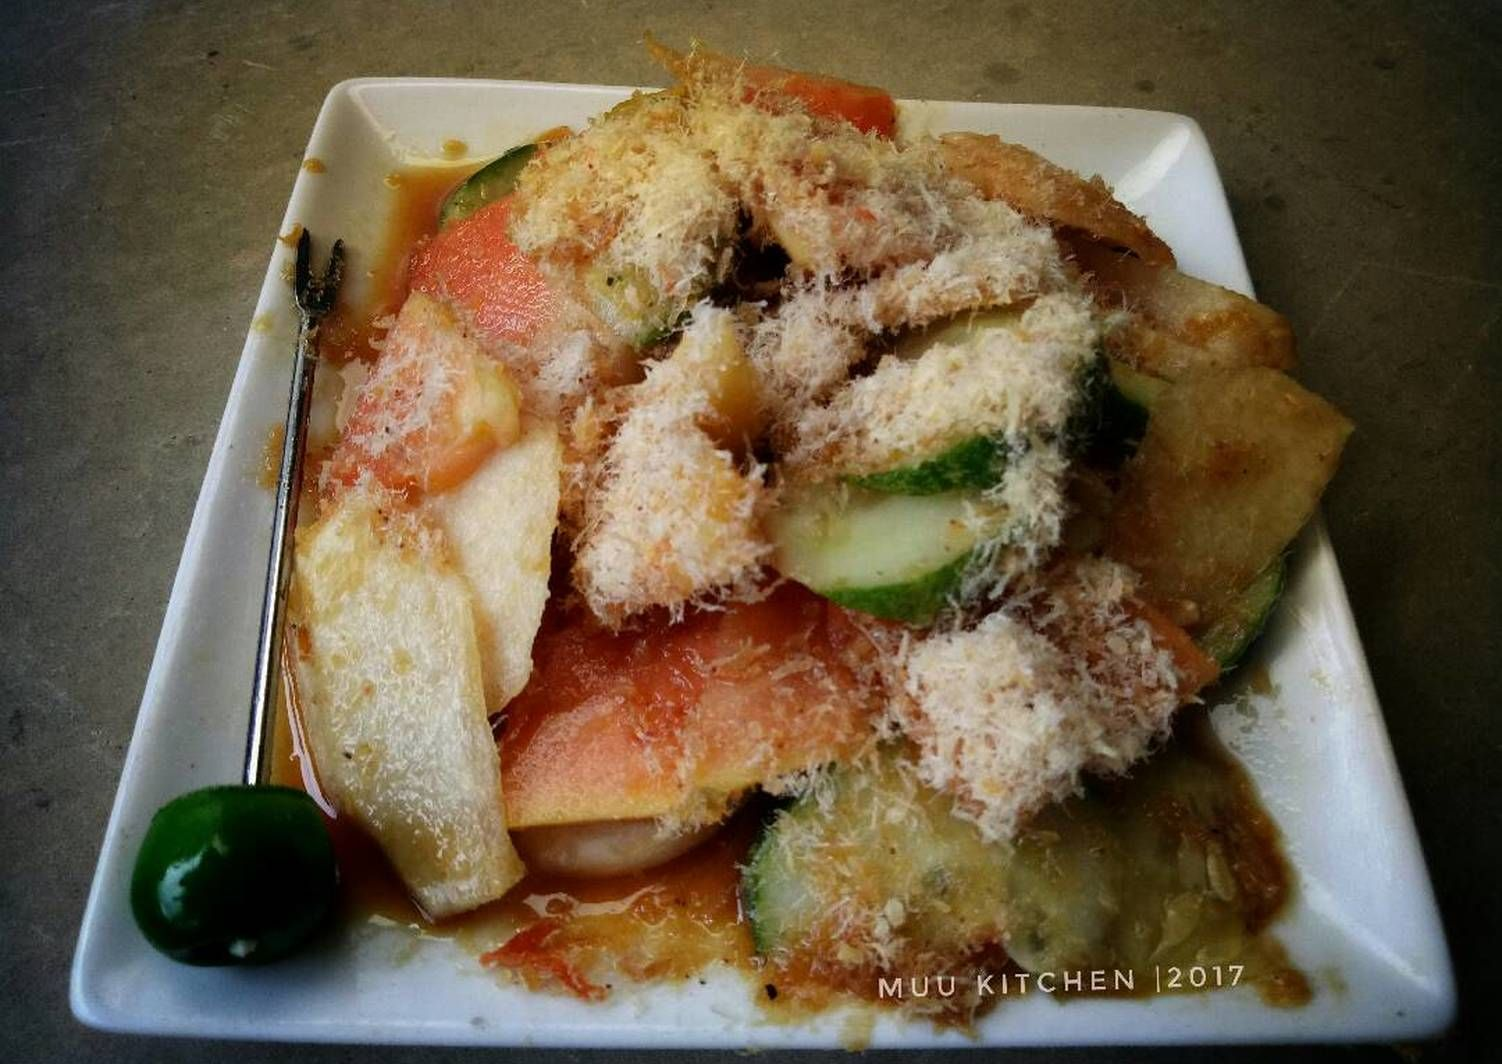 Resep Rujak Ebi Singkawang Oleh Muu Kitchen S Resep Makanan Resep Udang